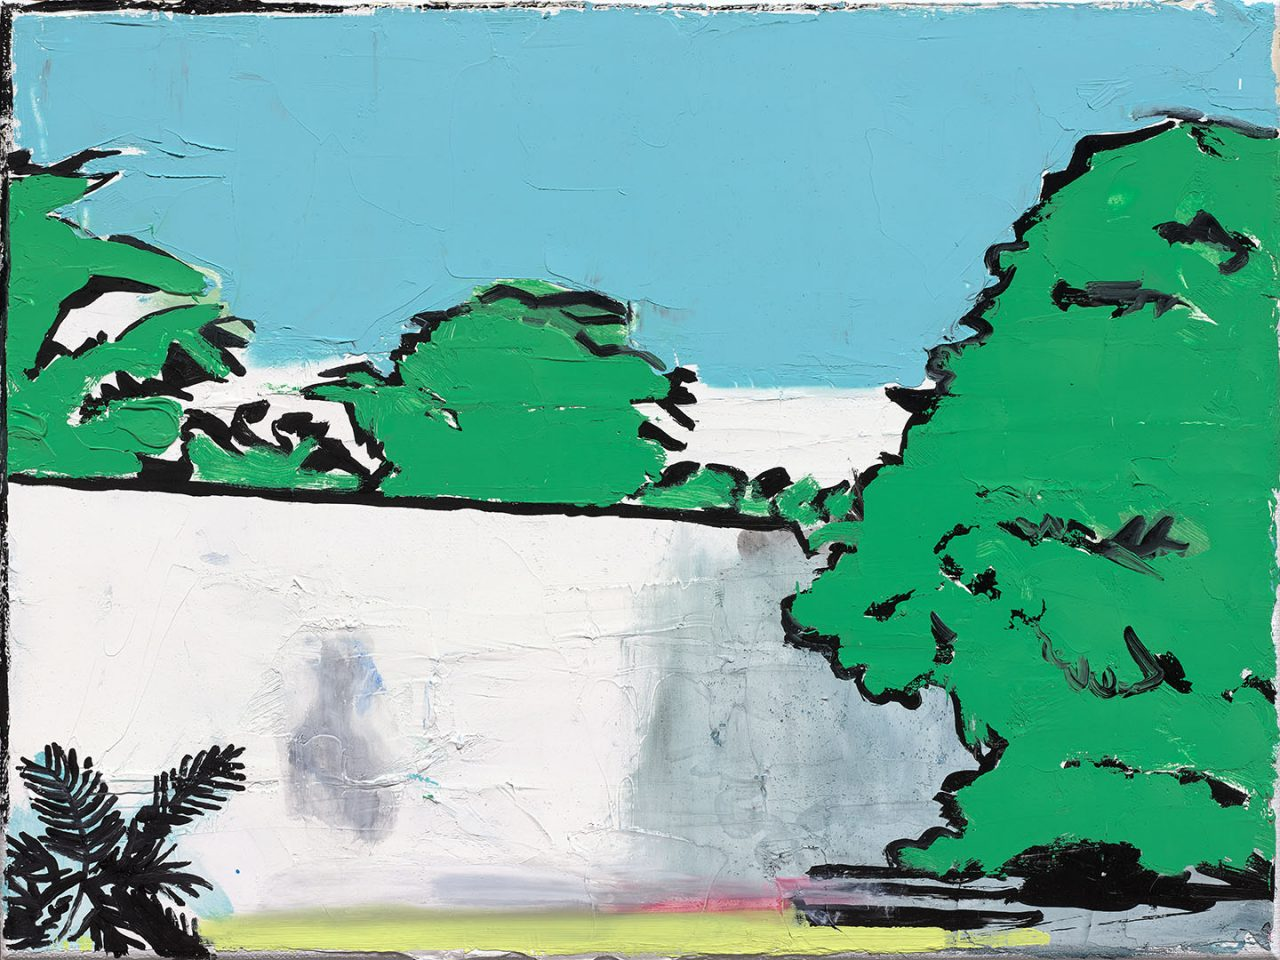 van Gogh series nr1, 2017. Oil on linen, size, 30x40cm